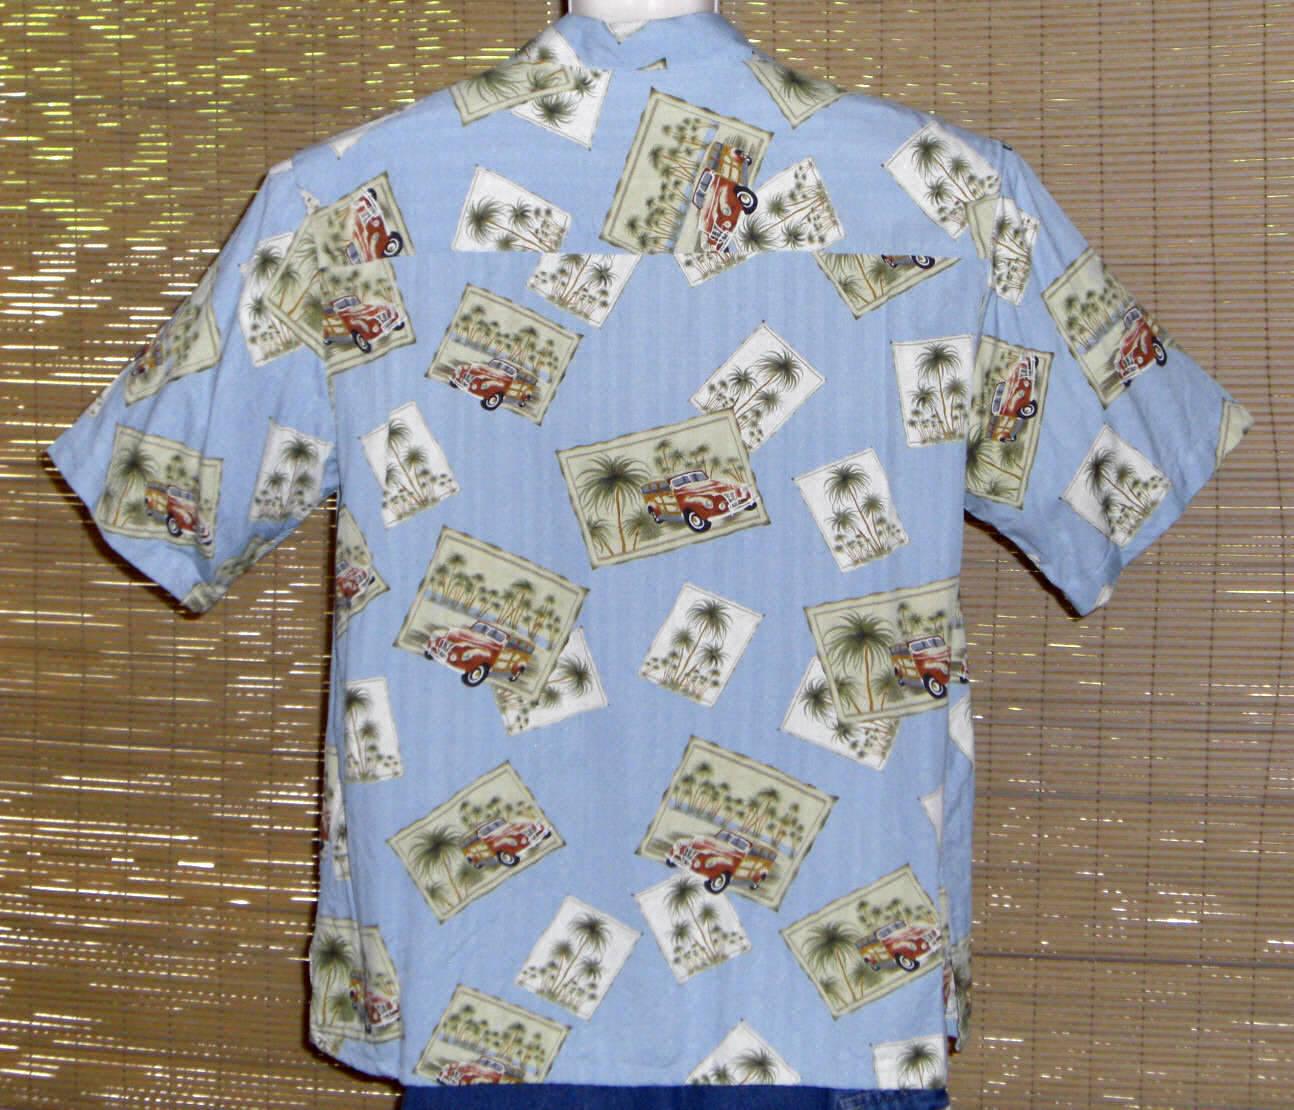 Banana Cabana Hawaiian Shirt Blue Woodies Design XL